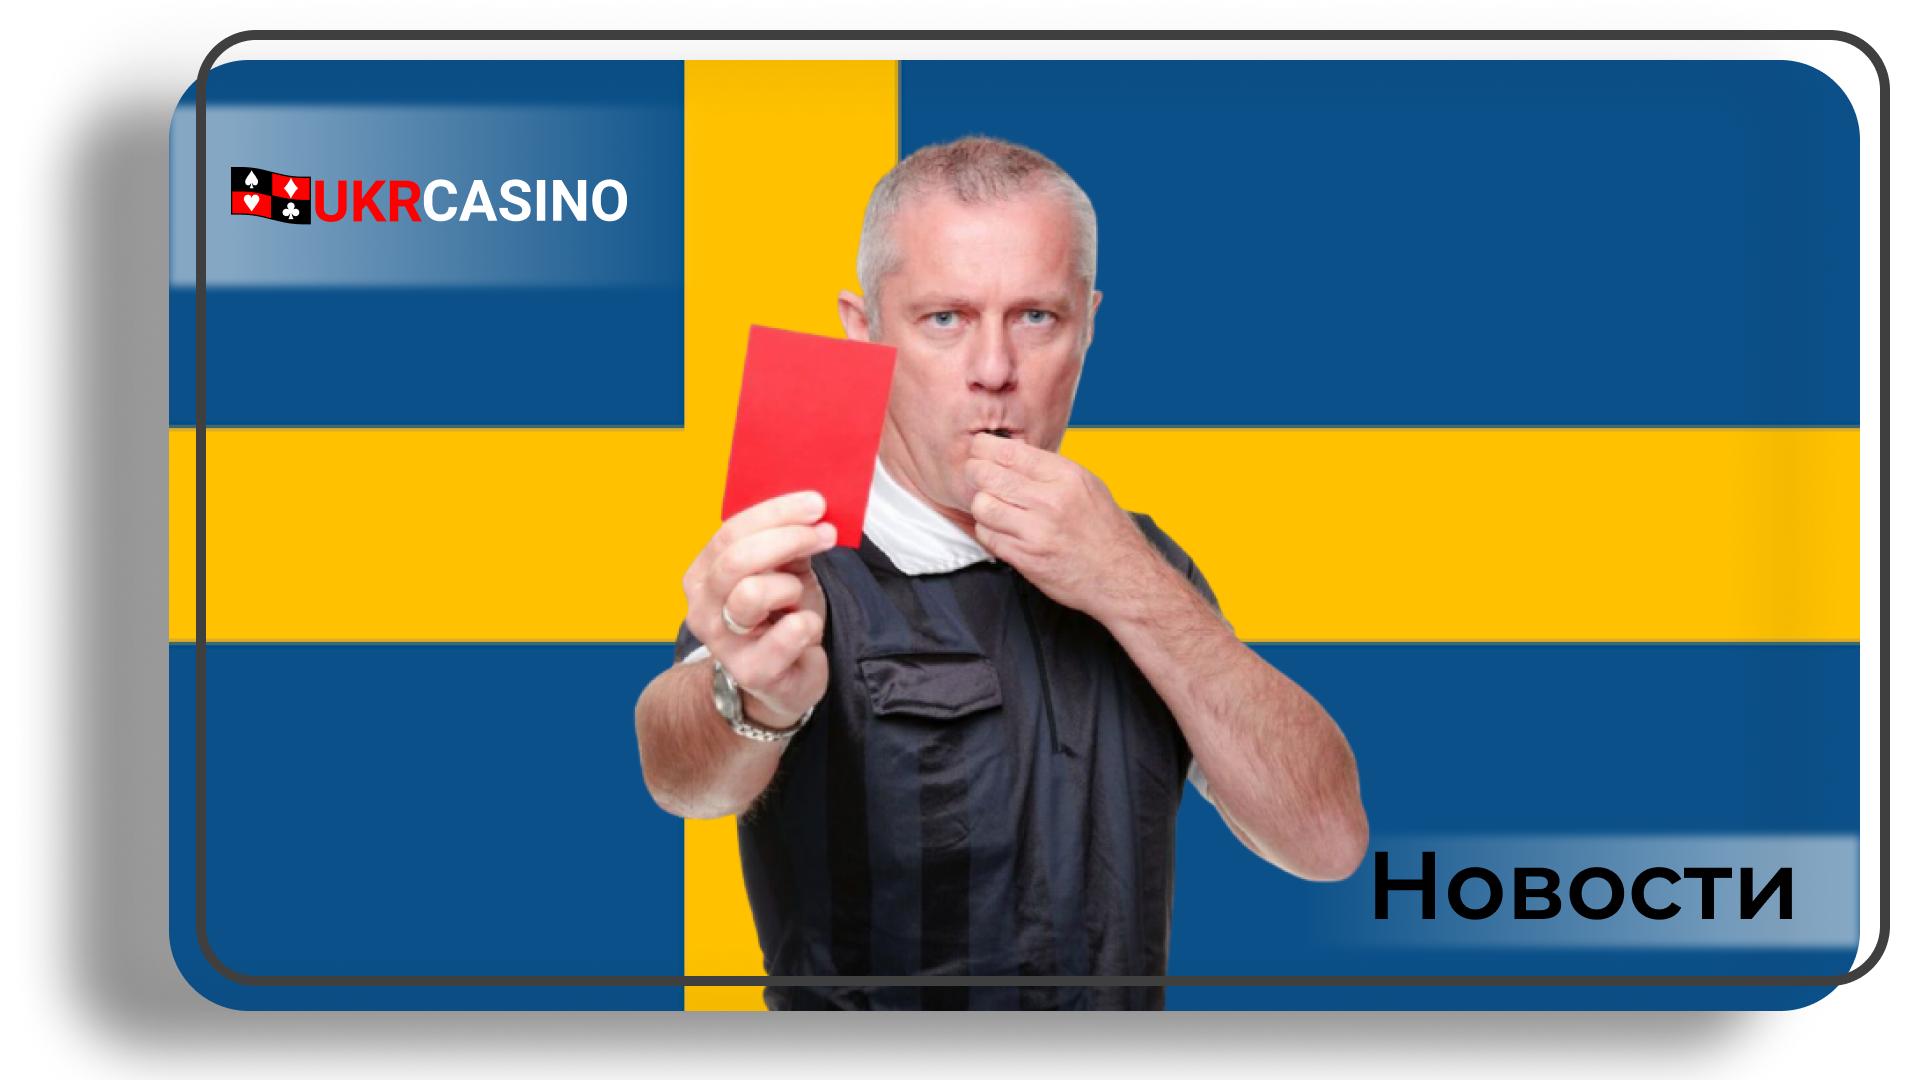 Шведский регулятор оштрафовал популярного букмекера